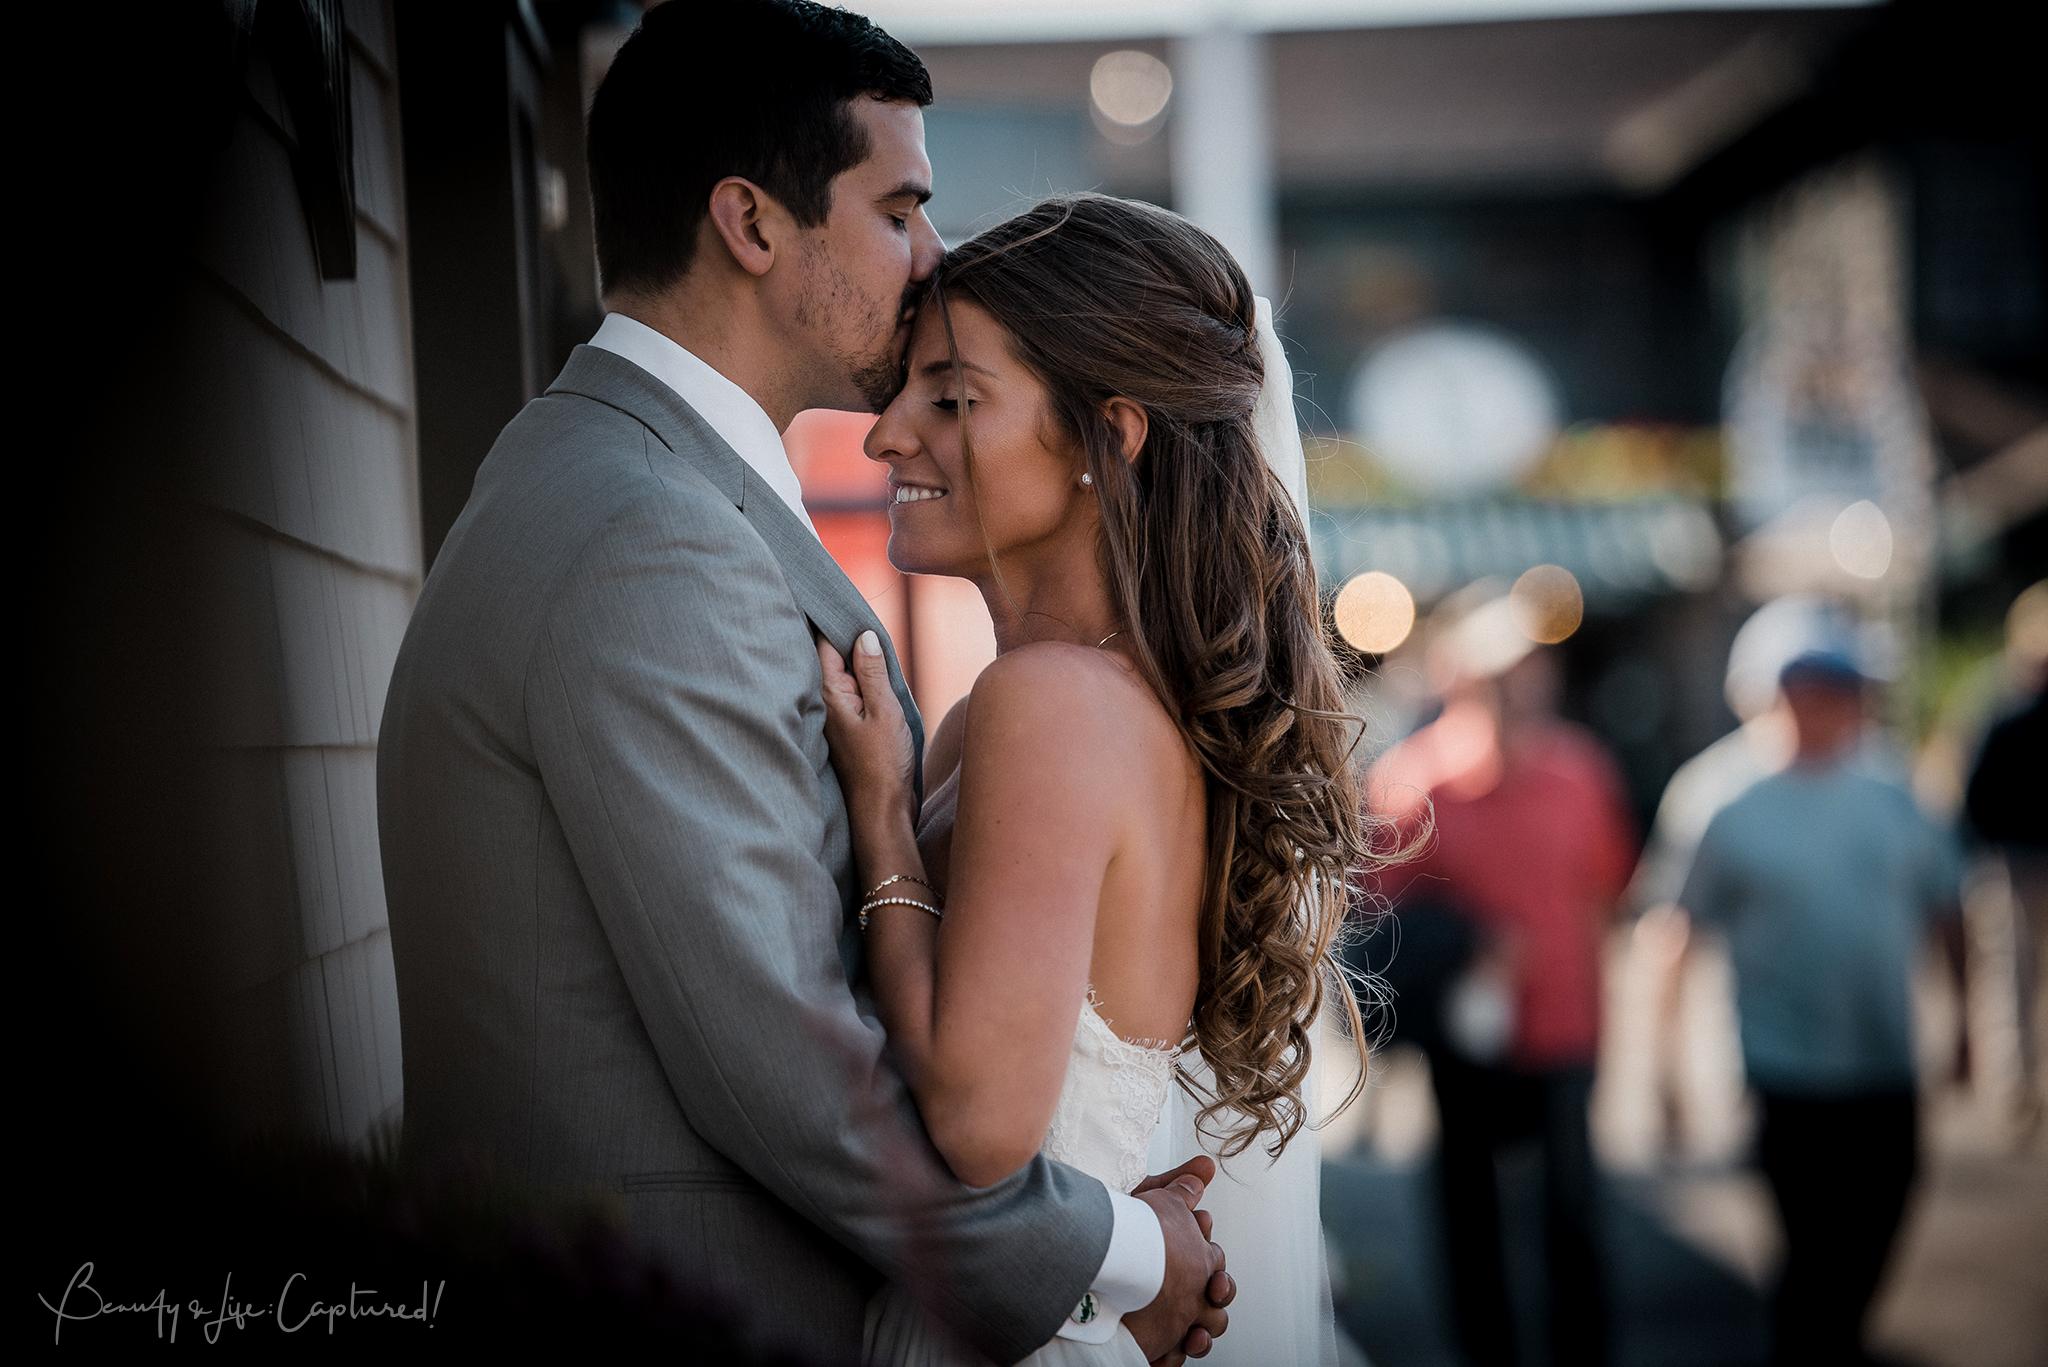 Beauty_and_Life_Captured_Athena_Wedding-14.jpg